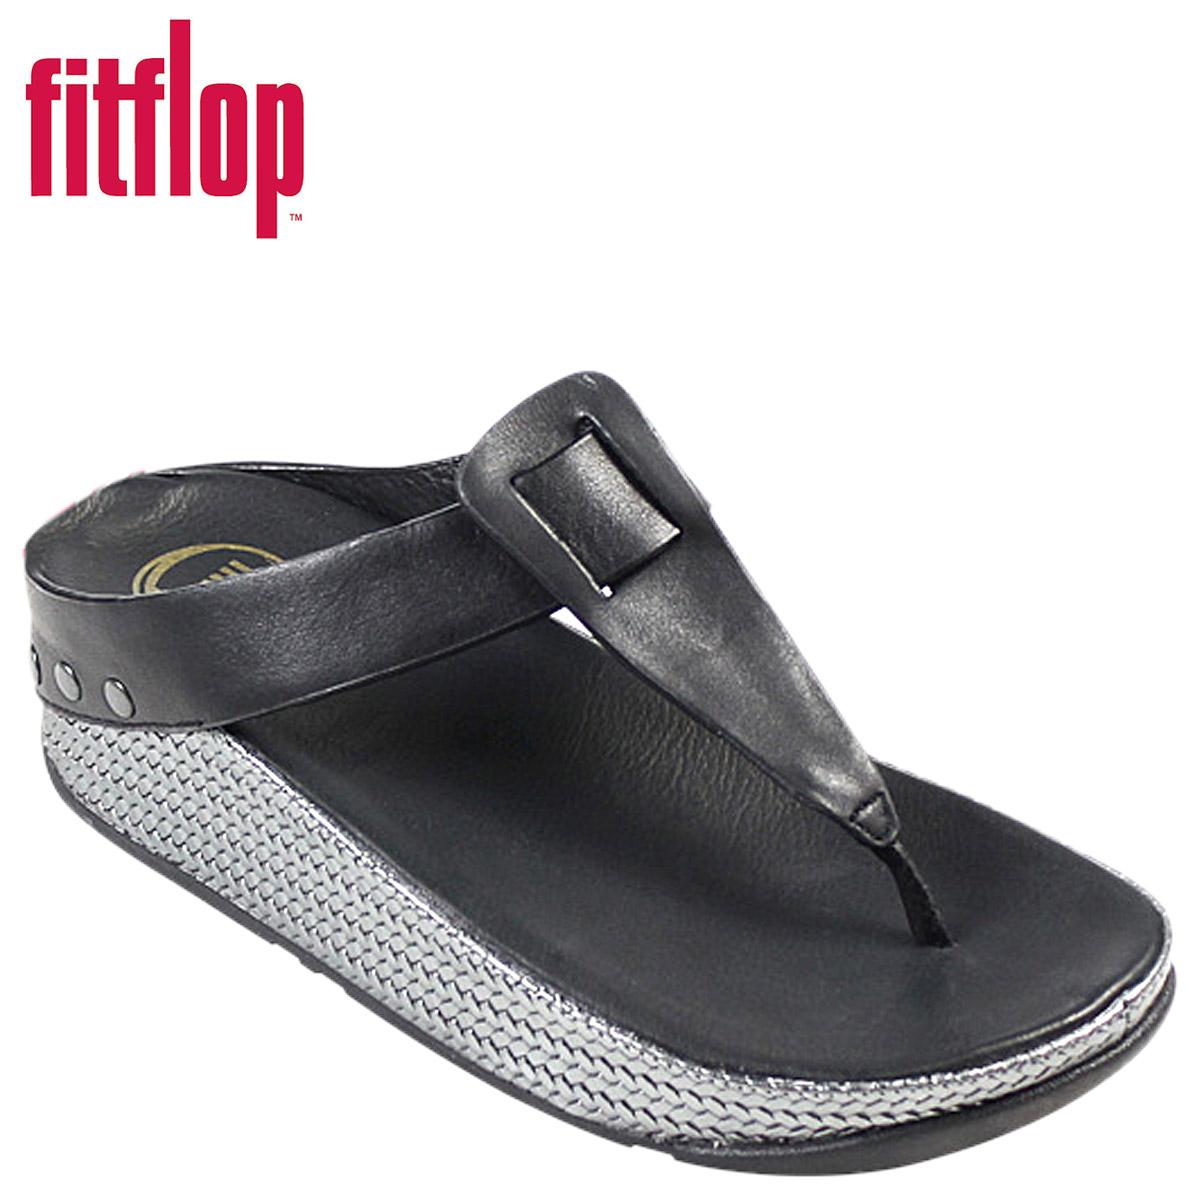 e8694b805 ALLSPORTS  Point 2 x fit flops FitFlop women s Ibiza sandal IBIZA ...